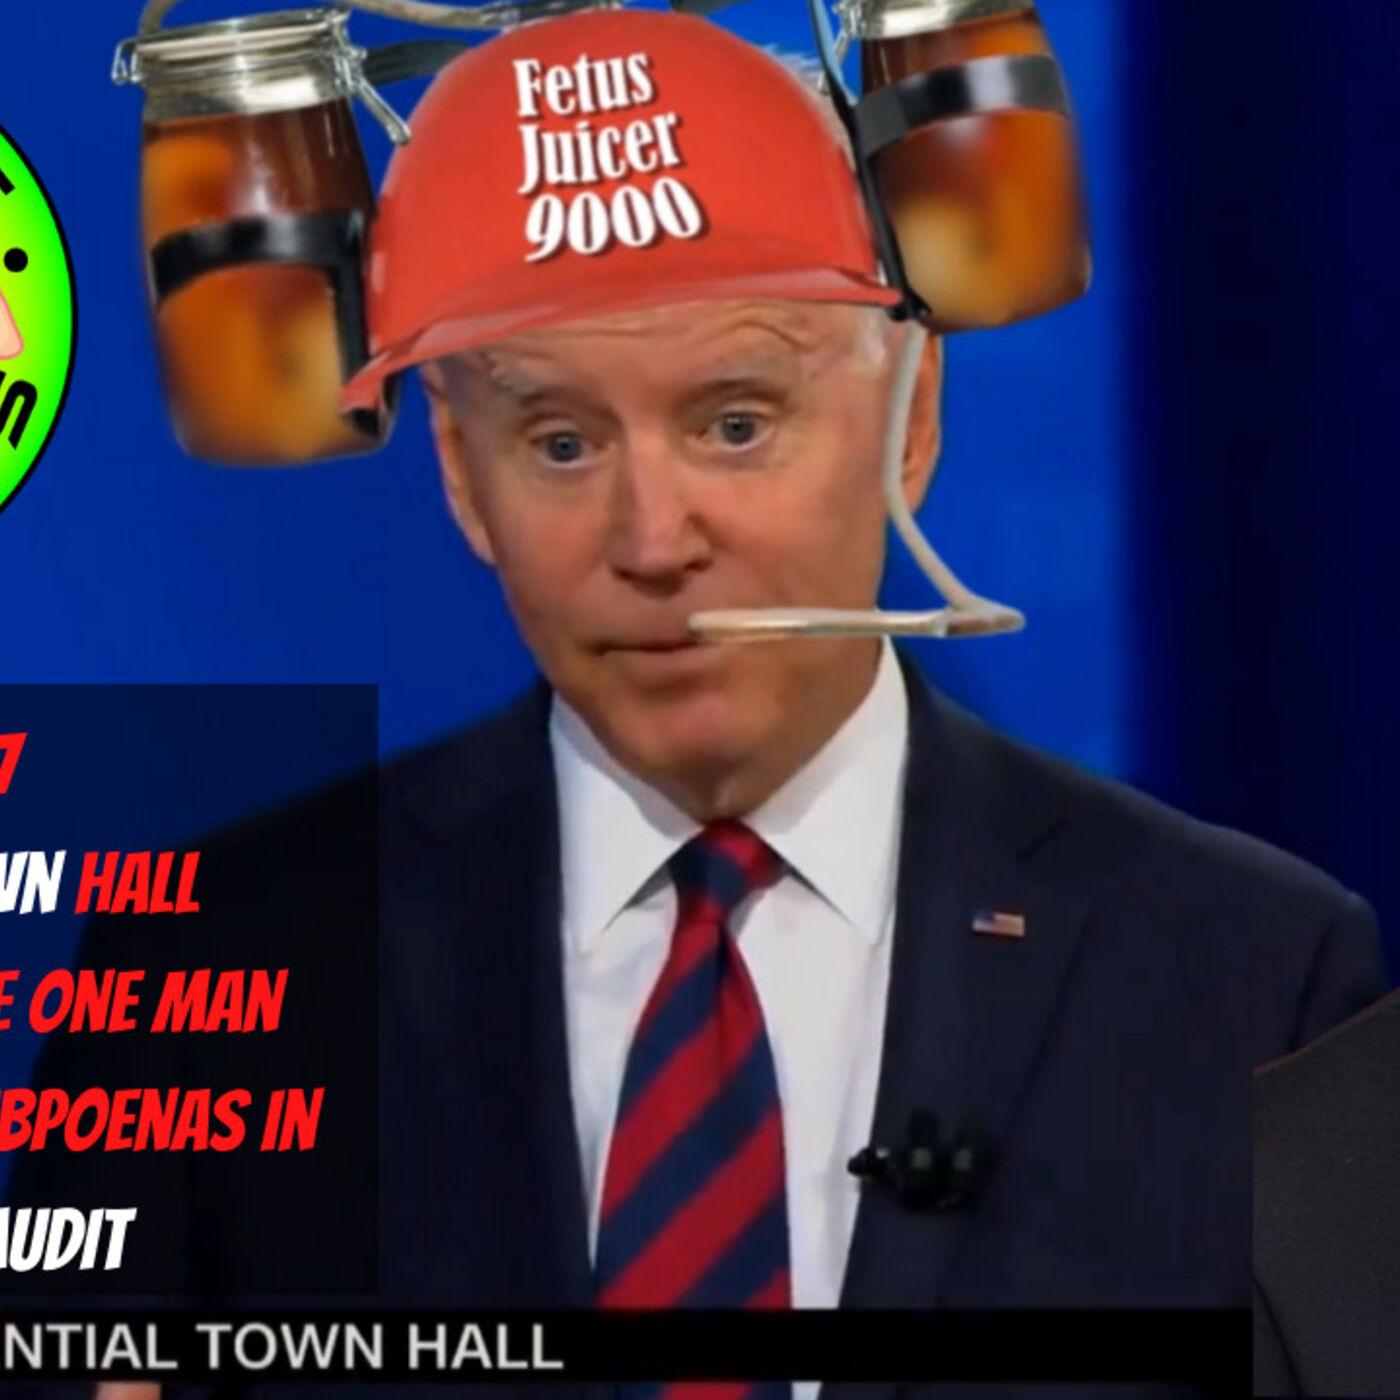 WS#77 Biden's Clown Hall, Paul Boyer- The One Man Stopping The Subpoenas In AZ Audit